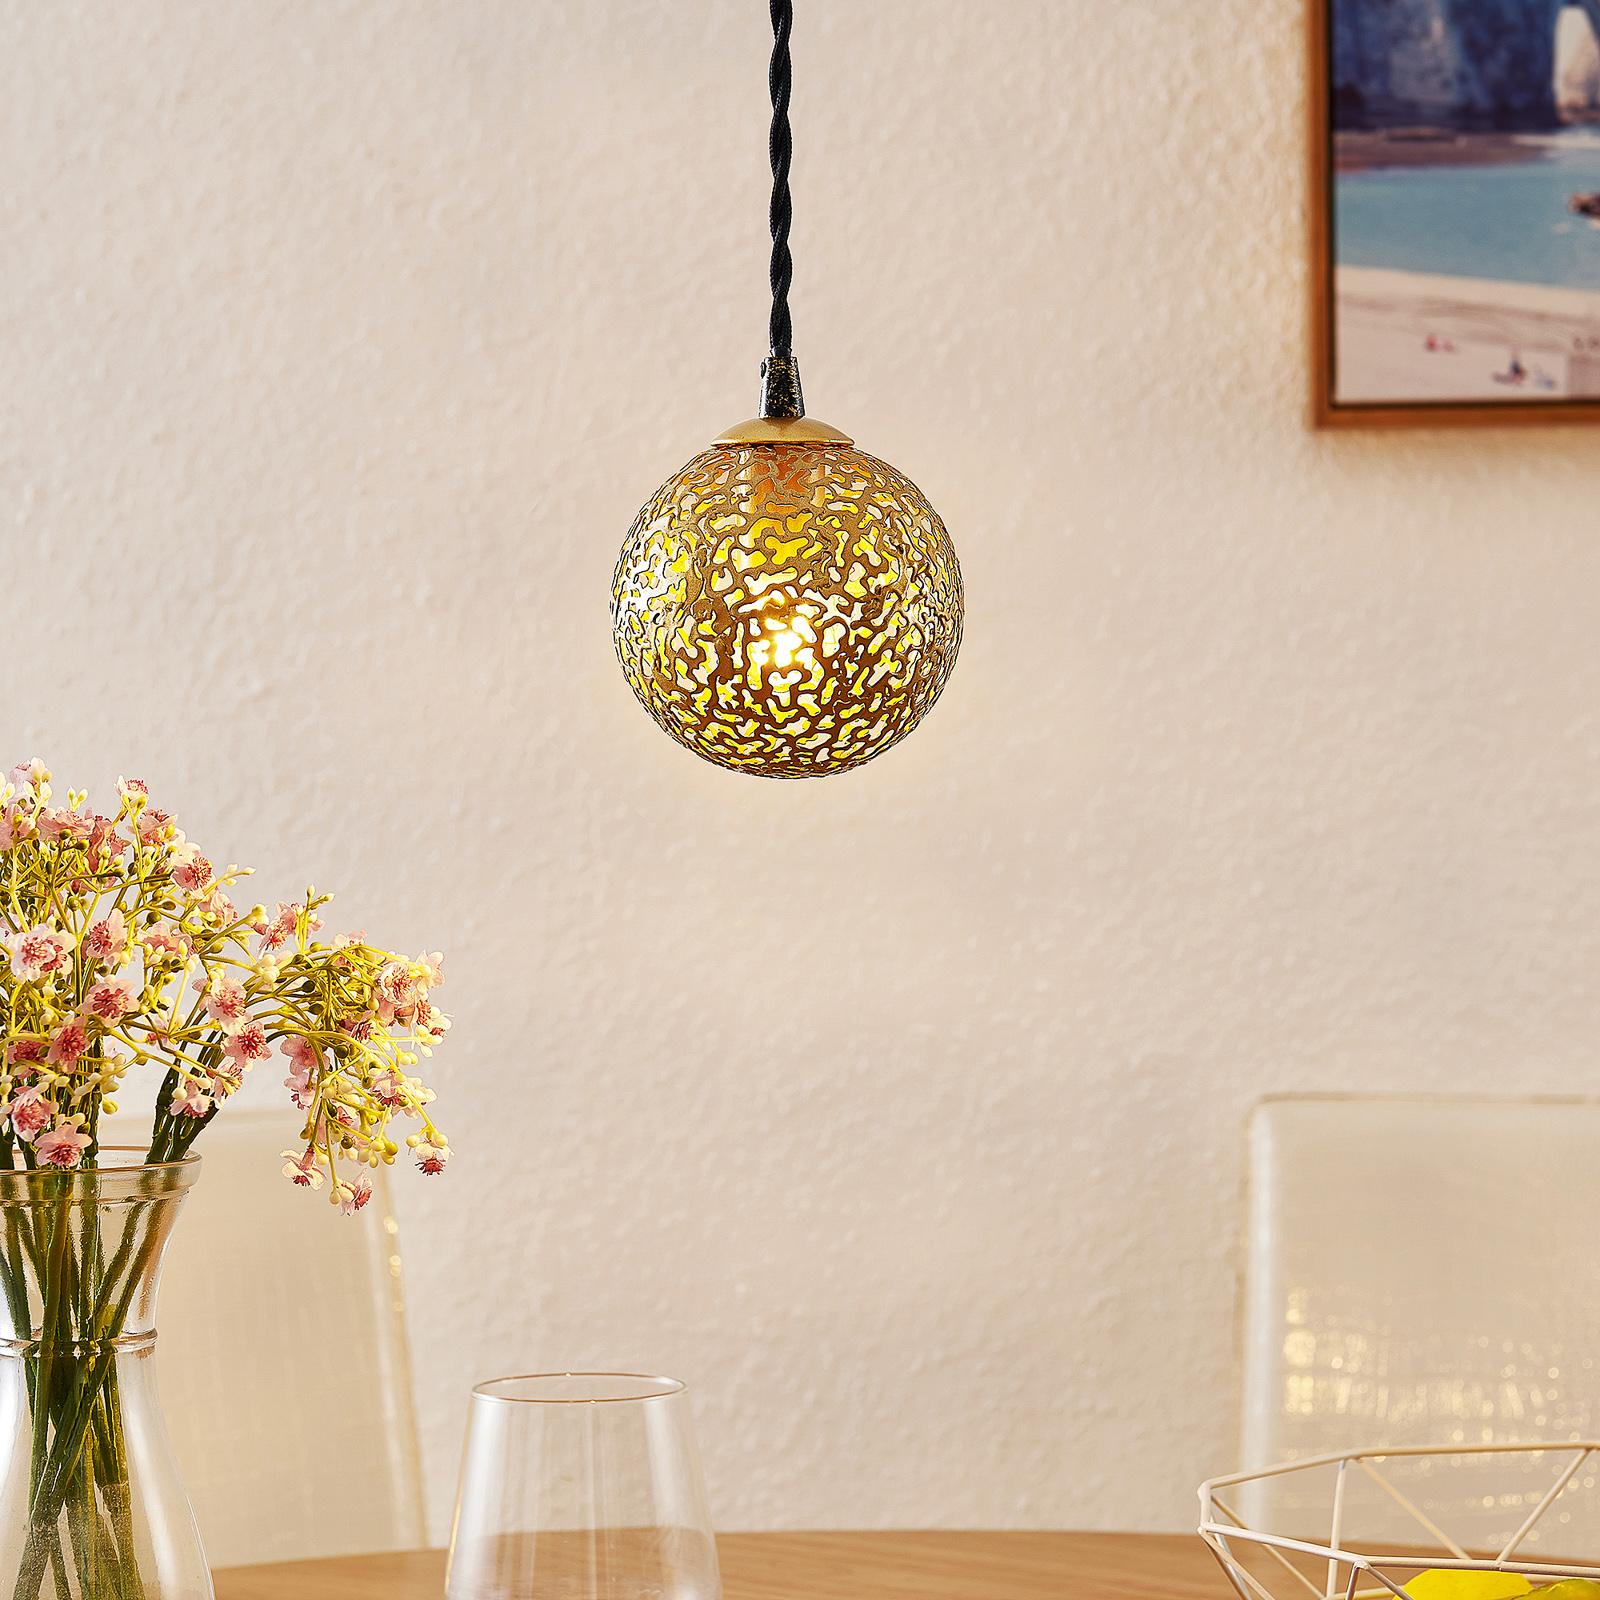 Lucande Zale suspension, orientale, à 1 lampe